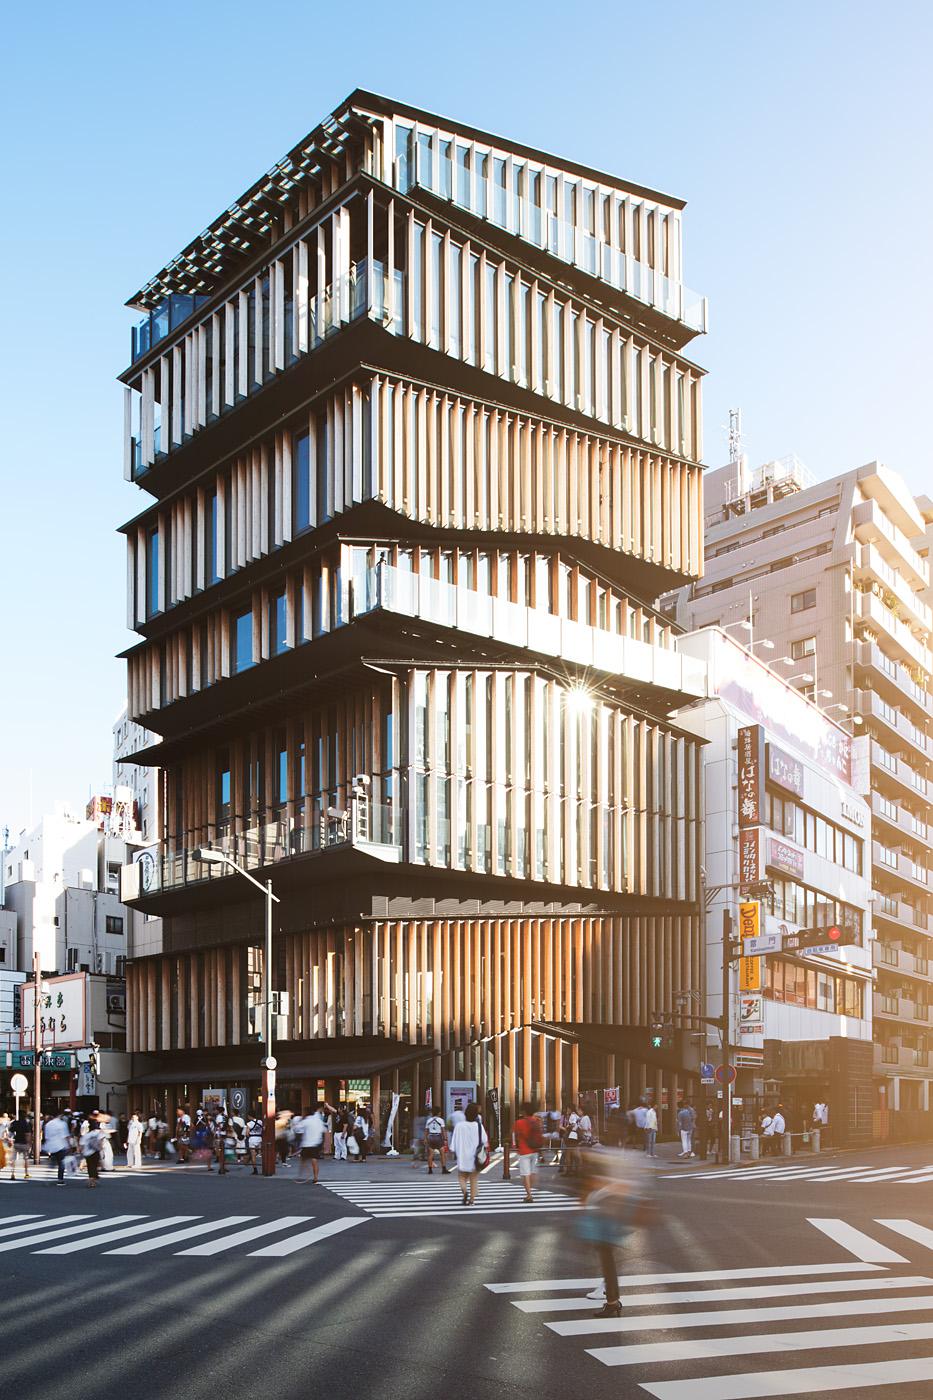 Asakusa Culture and Tourism Center